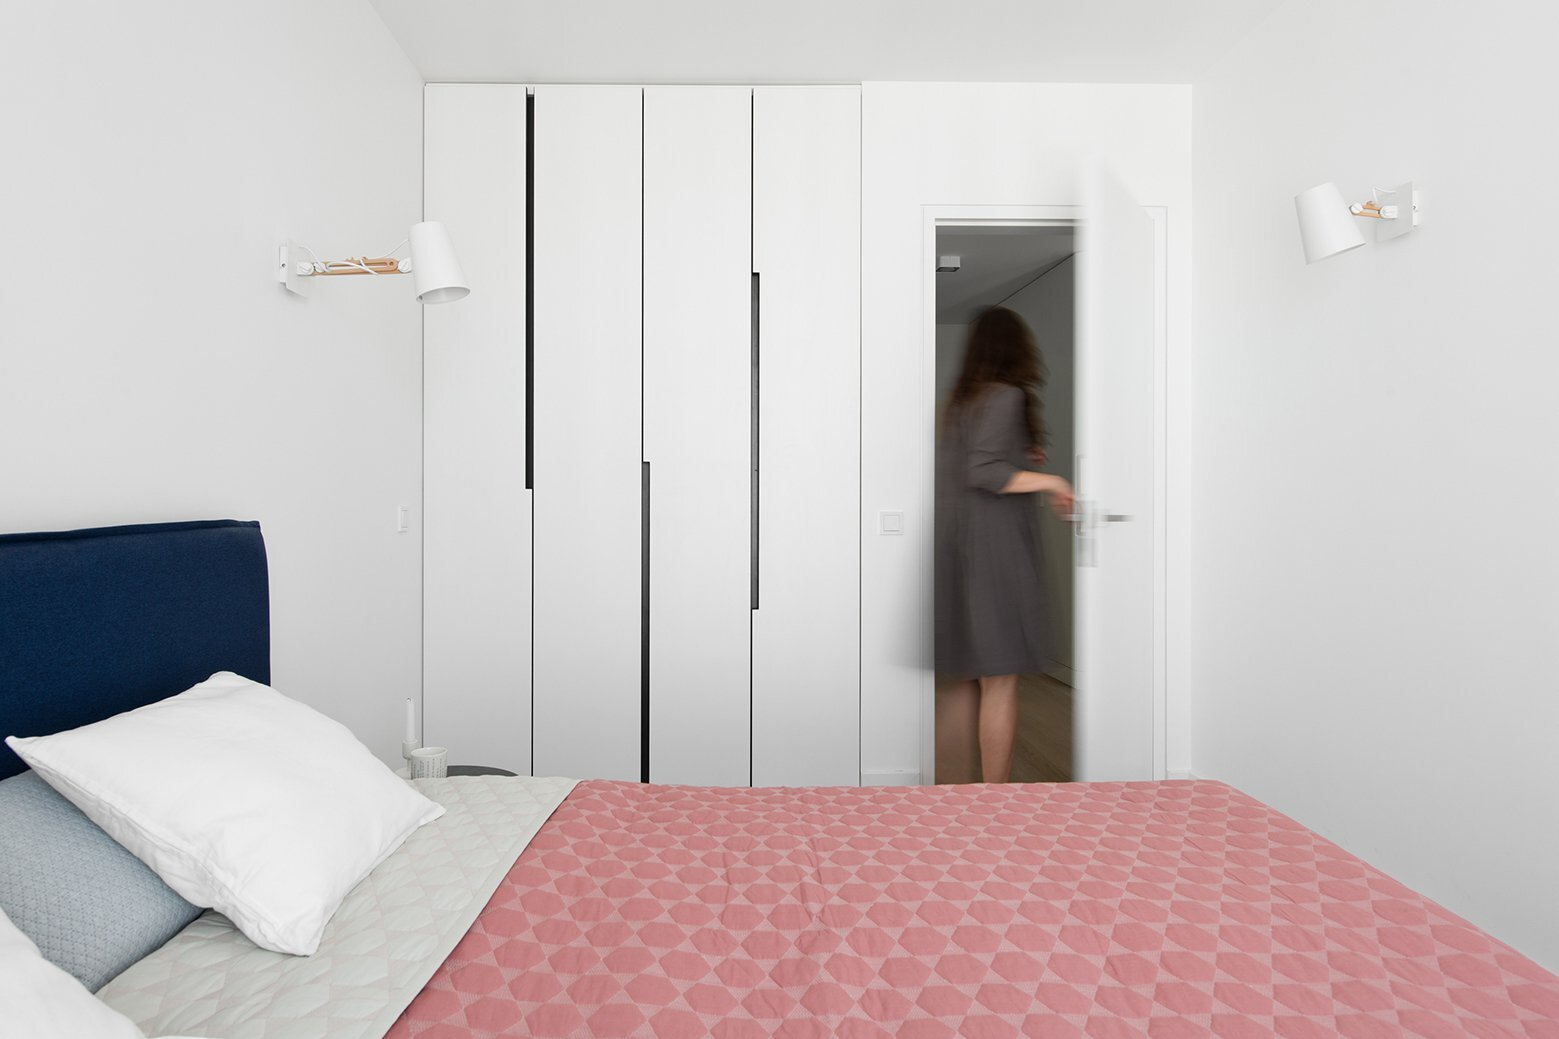 Apartment in Vilnius - Normundas Vilkas - Lithuania - Bedroom - Humble Homes